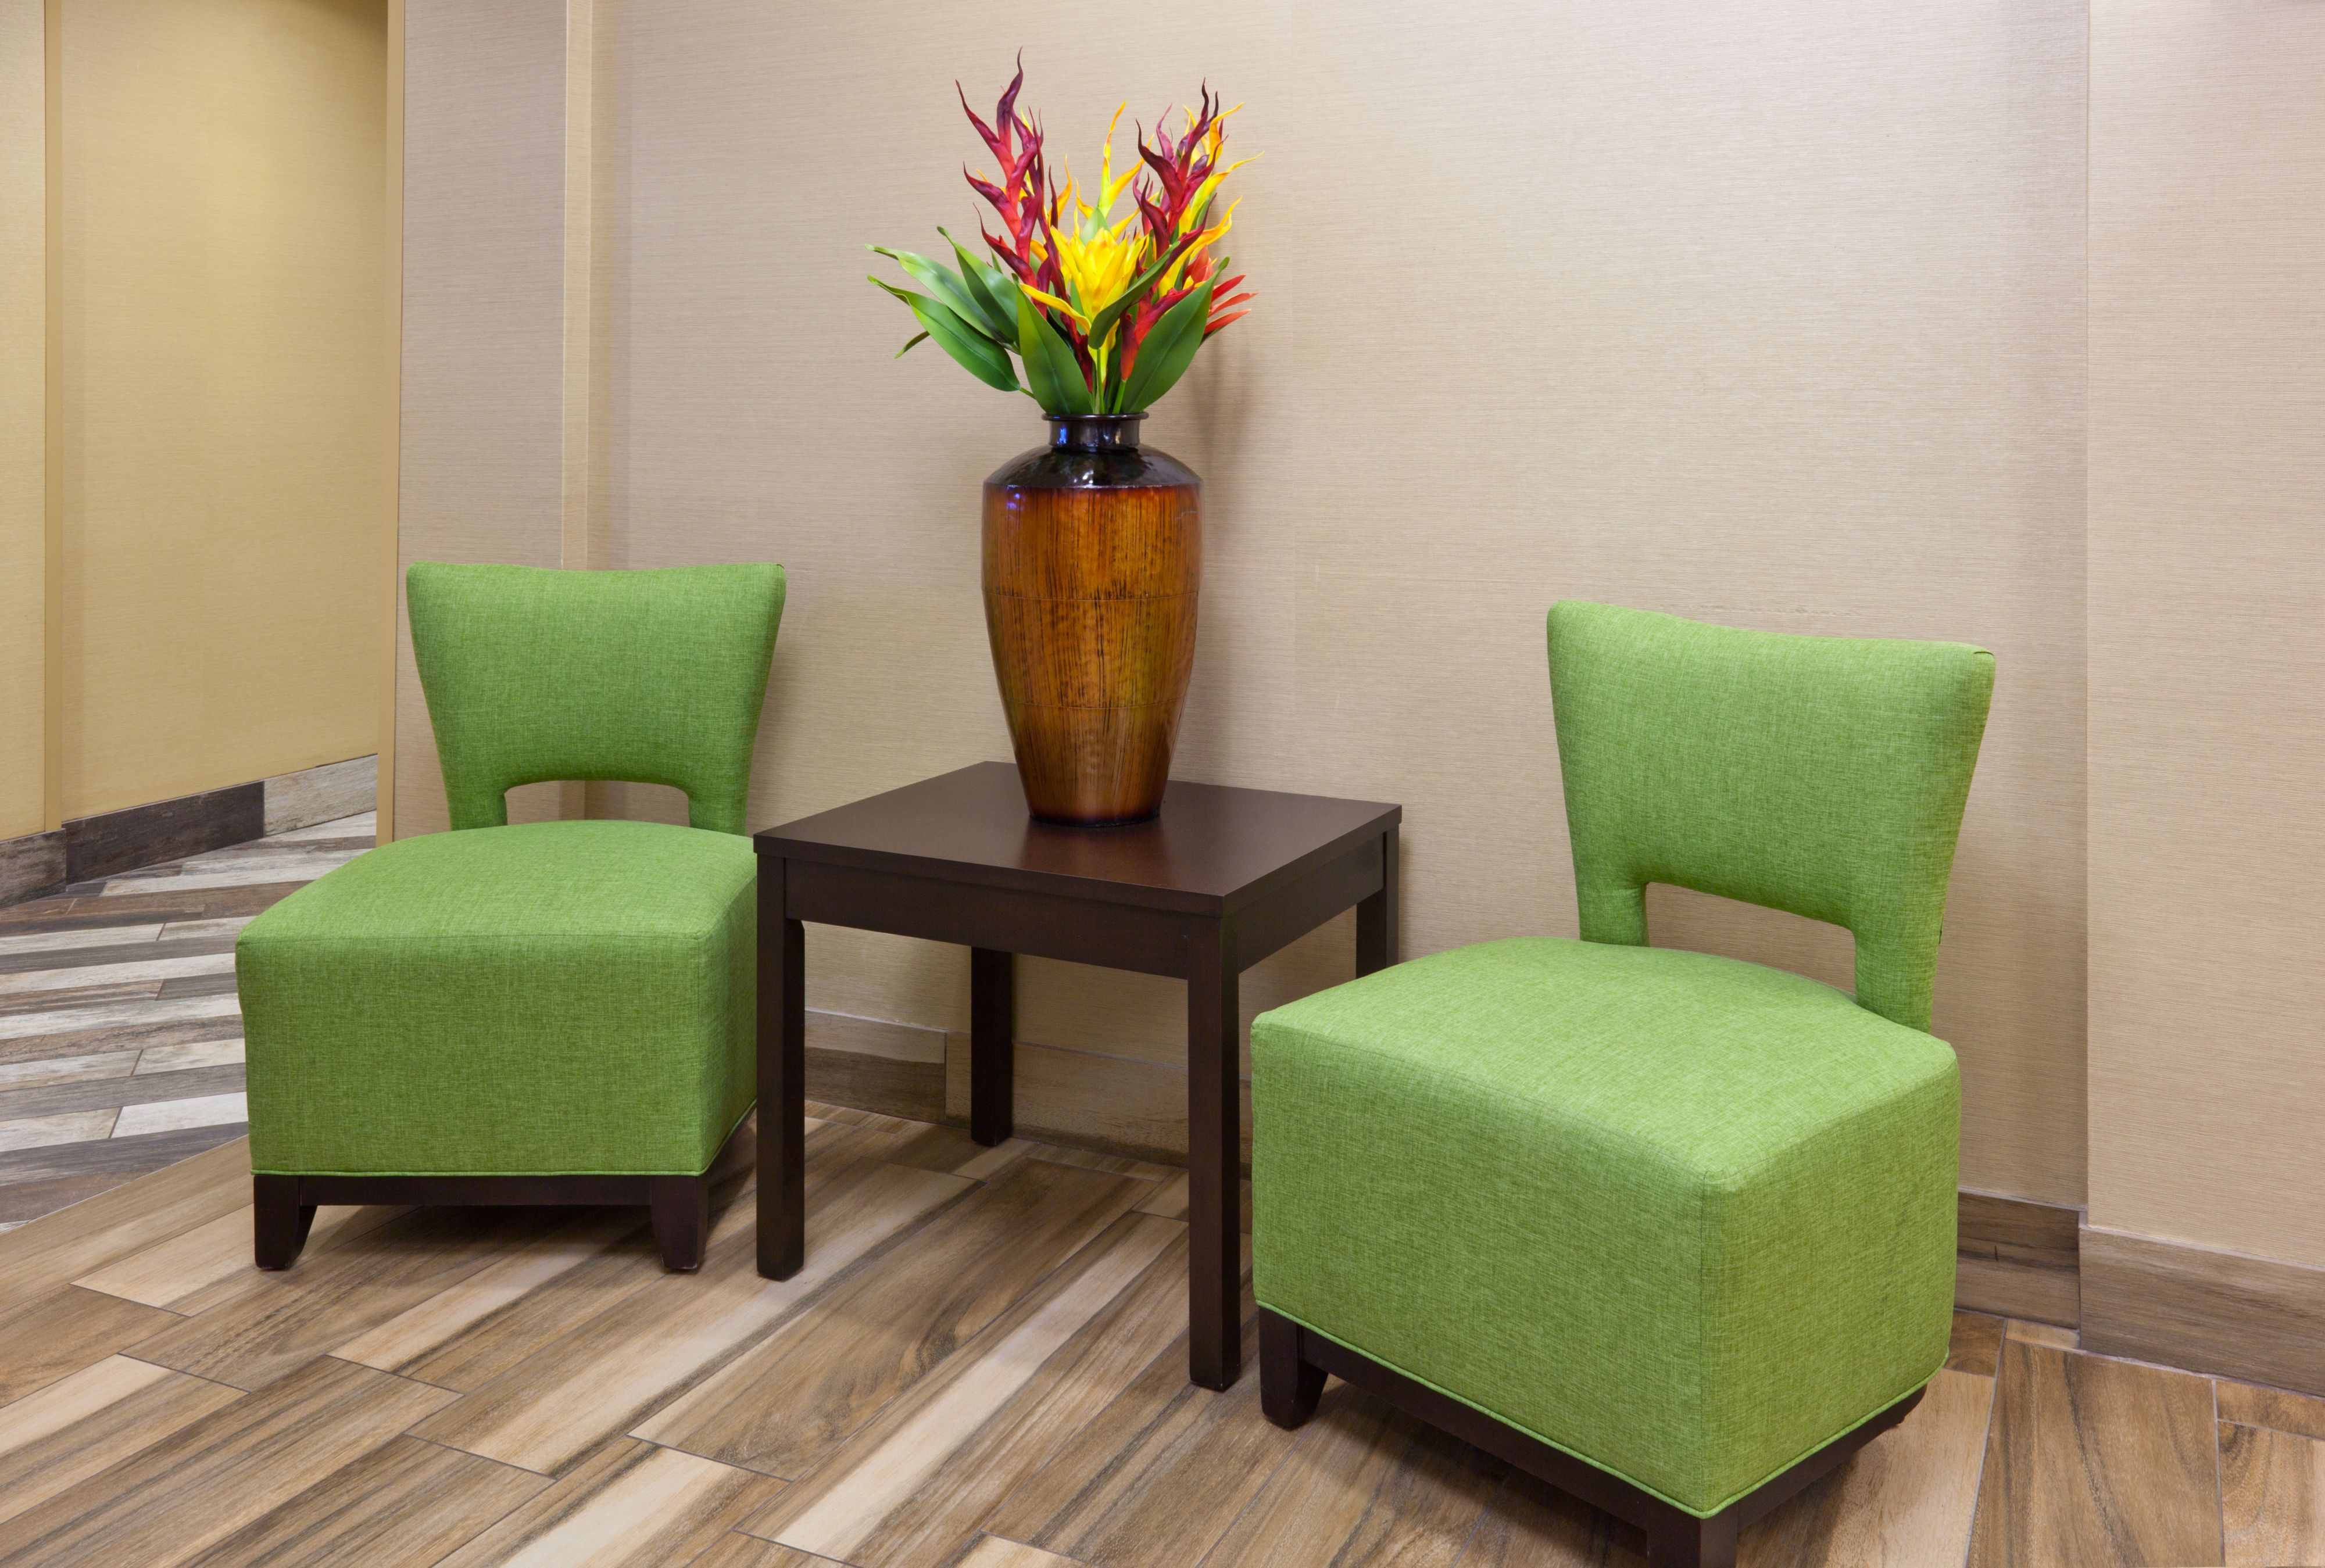 Holiday Inn Express & Suites Fort Dodge image 4